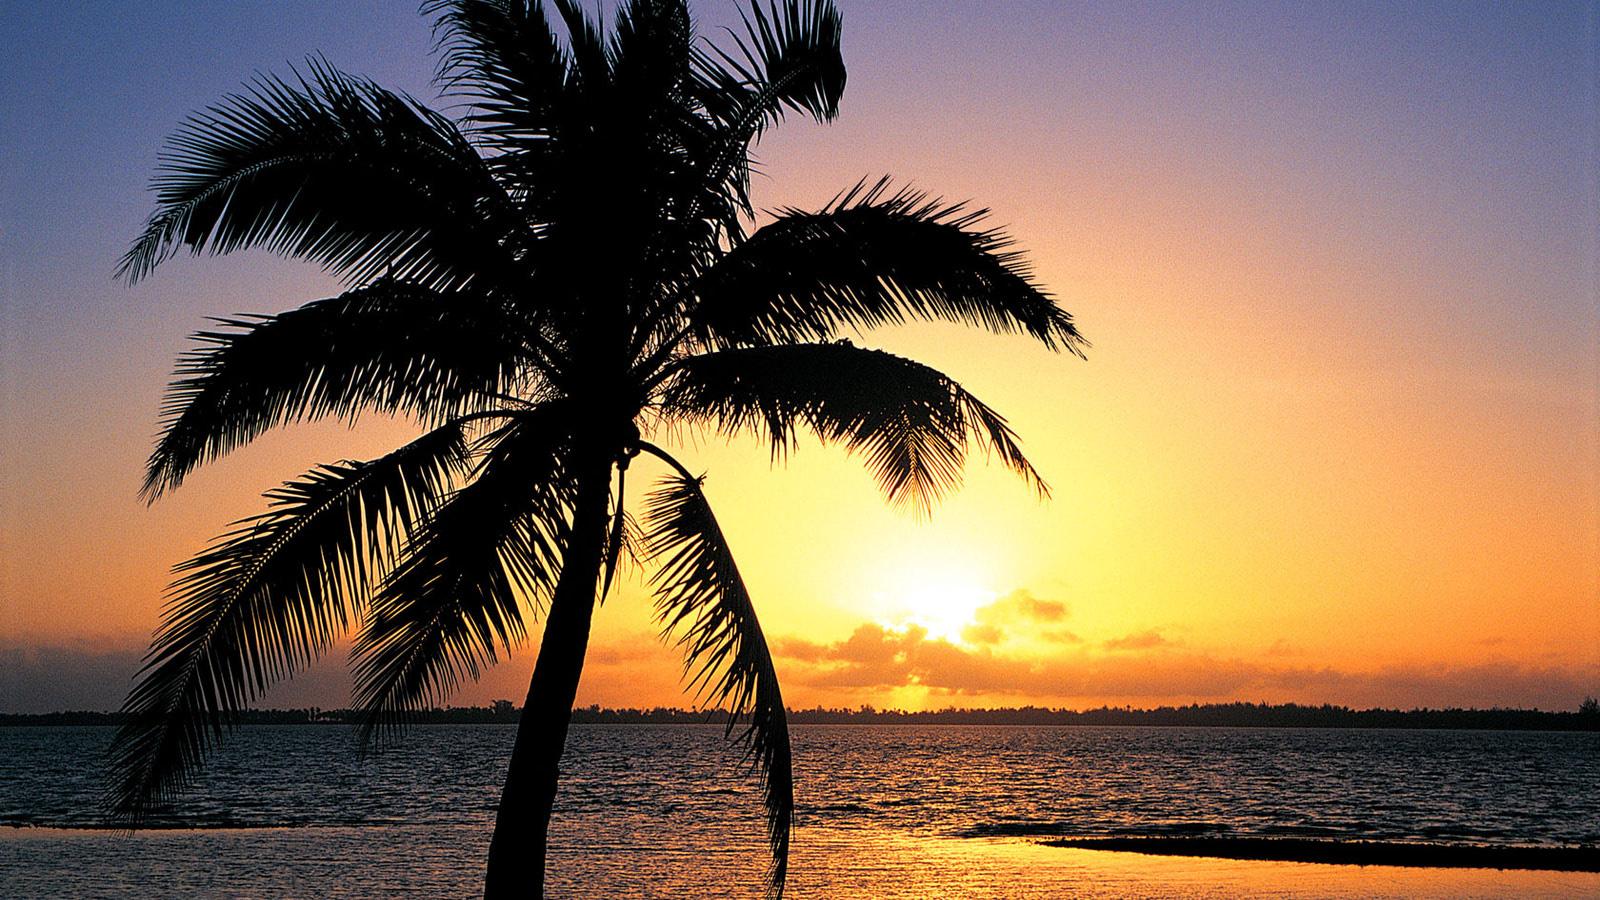 Wonderful Wallpaper Macbook Palm Tree - orange-sunset-on-the-tropic-beach-background-1600x900-174  Gallery_392111.jpg